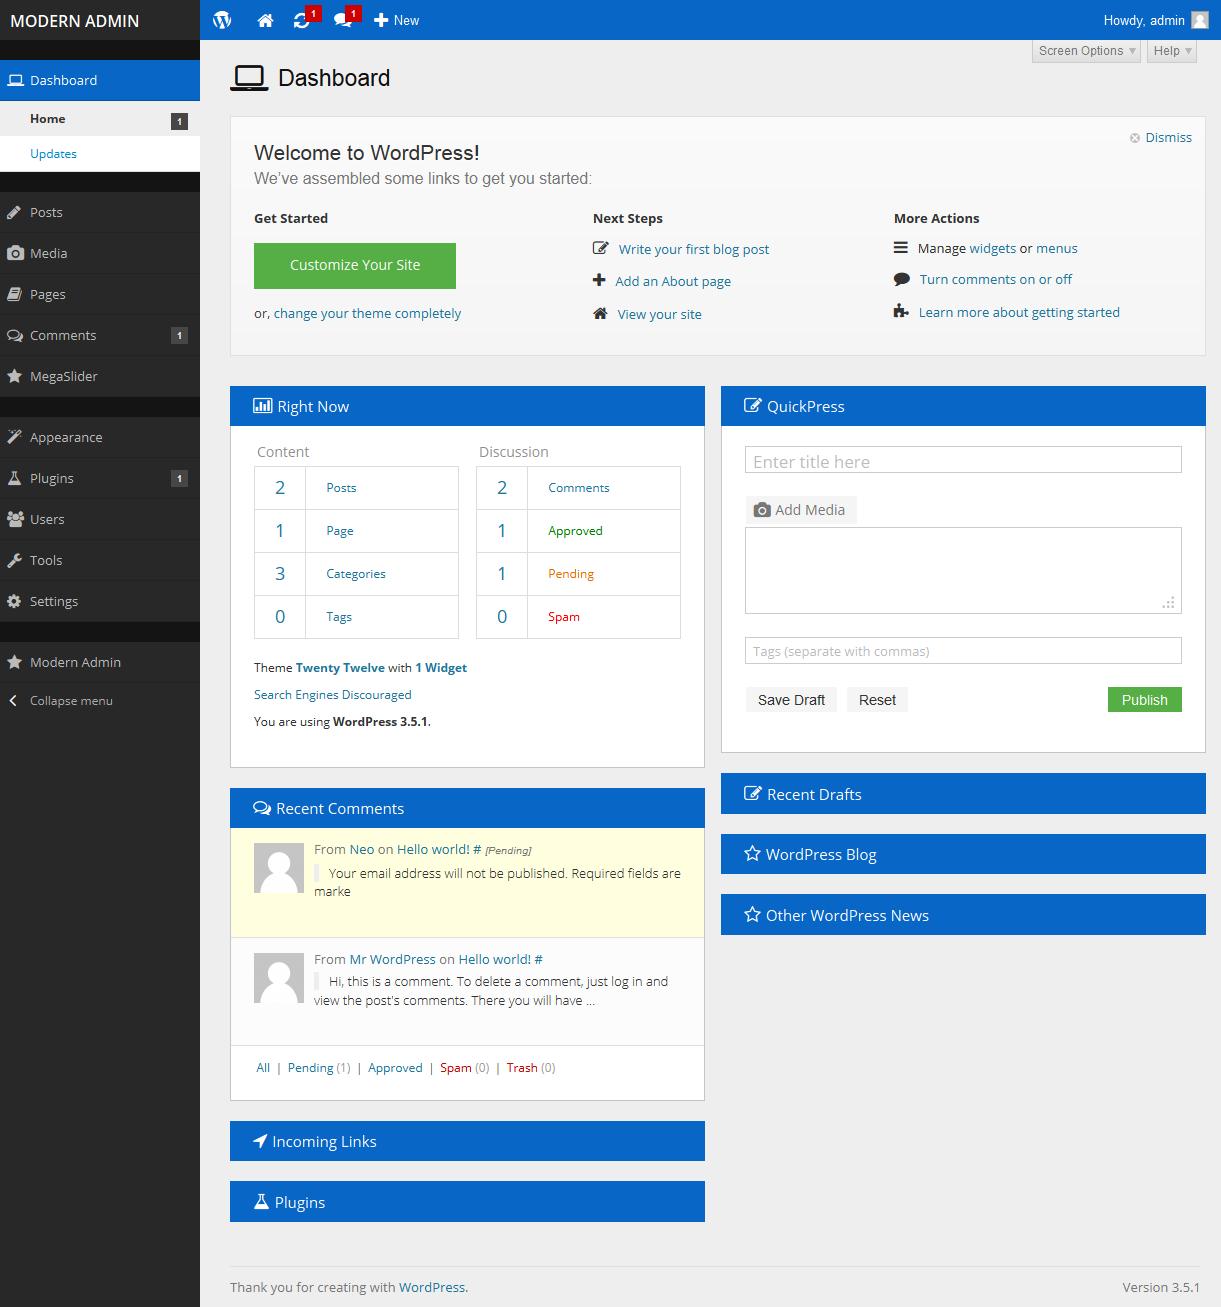 Modern Admin - Flat WordPress Admin Theme